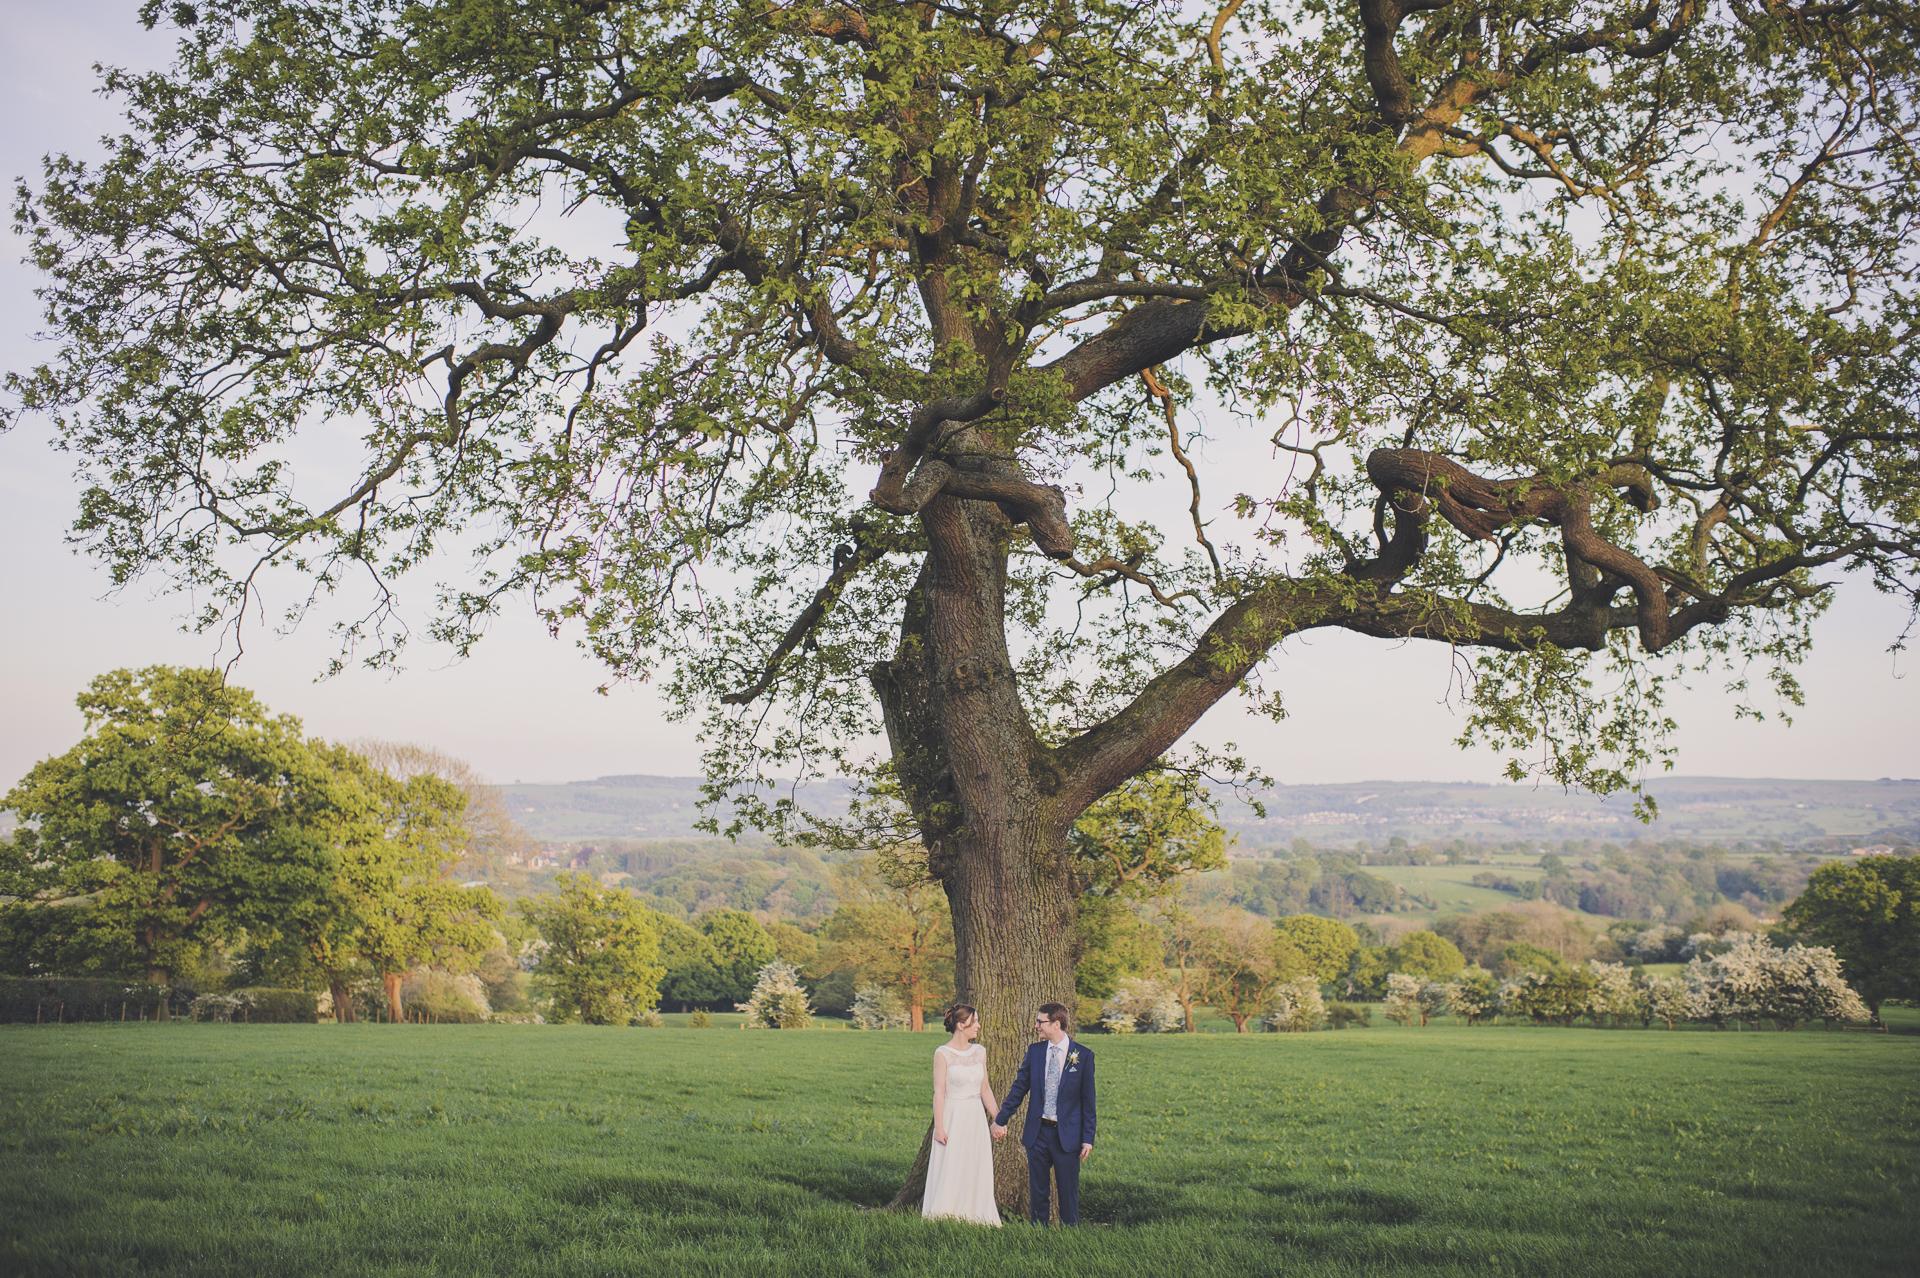 Organic weddings and celebrations